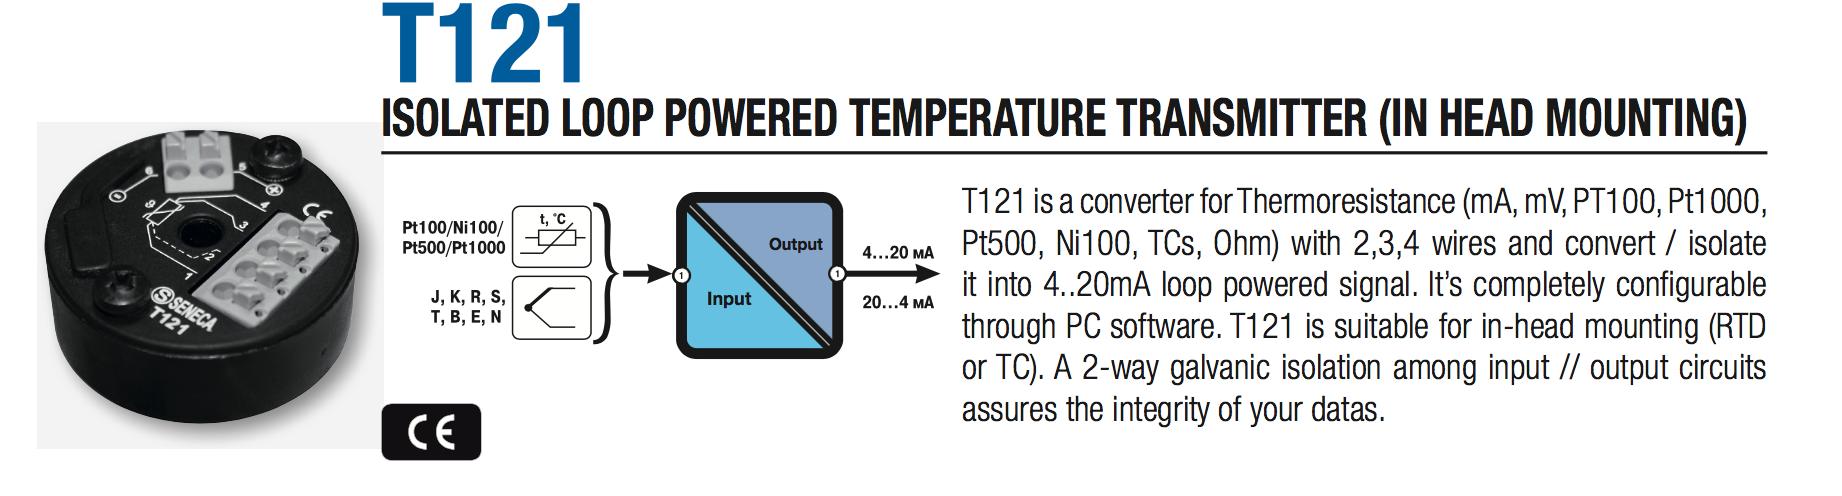 bộ chuyển đổi tín hiệu thermocouple Seneca T121